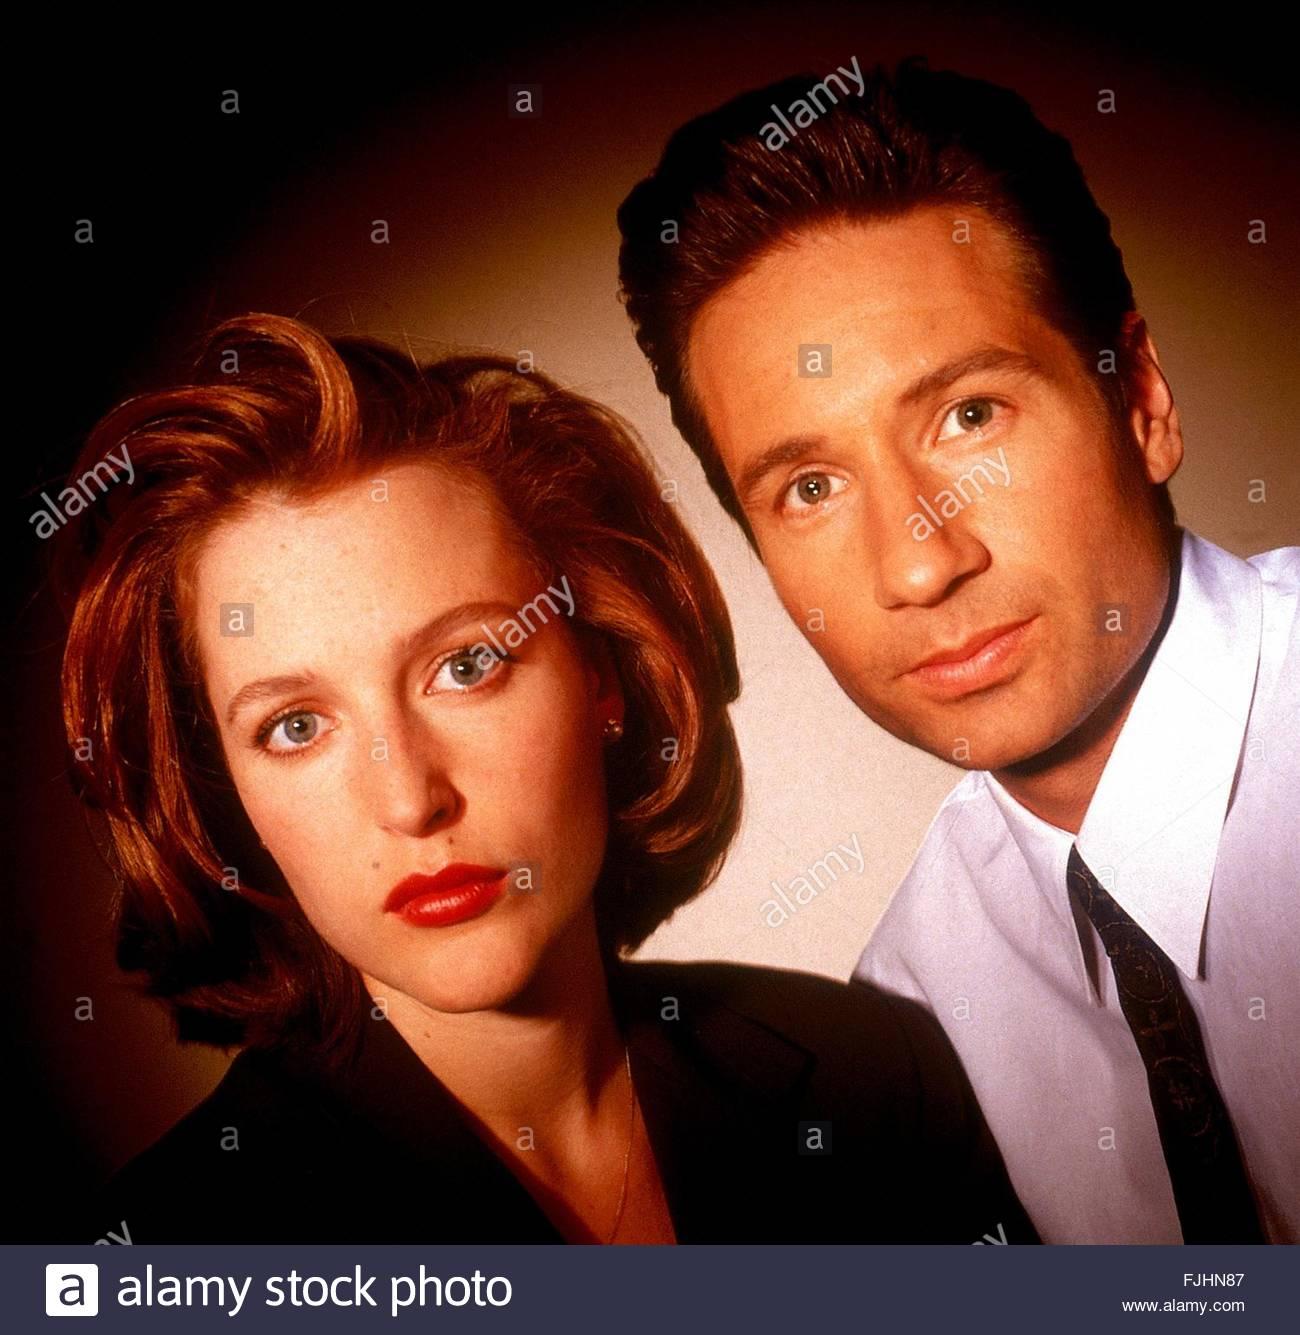 GILLIAN ANDERSON, DAVID DUCHOVNY, THE X FILES, 1993 - Stock Image